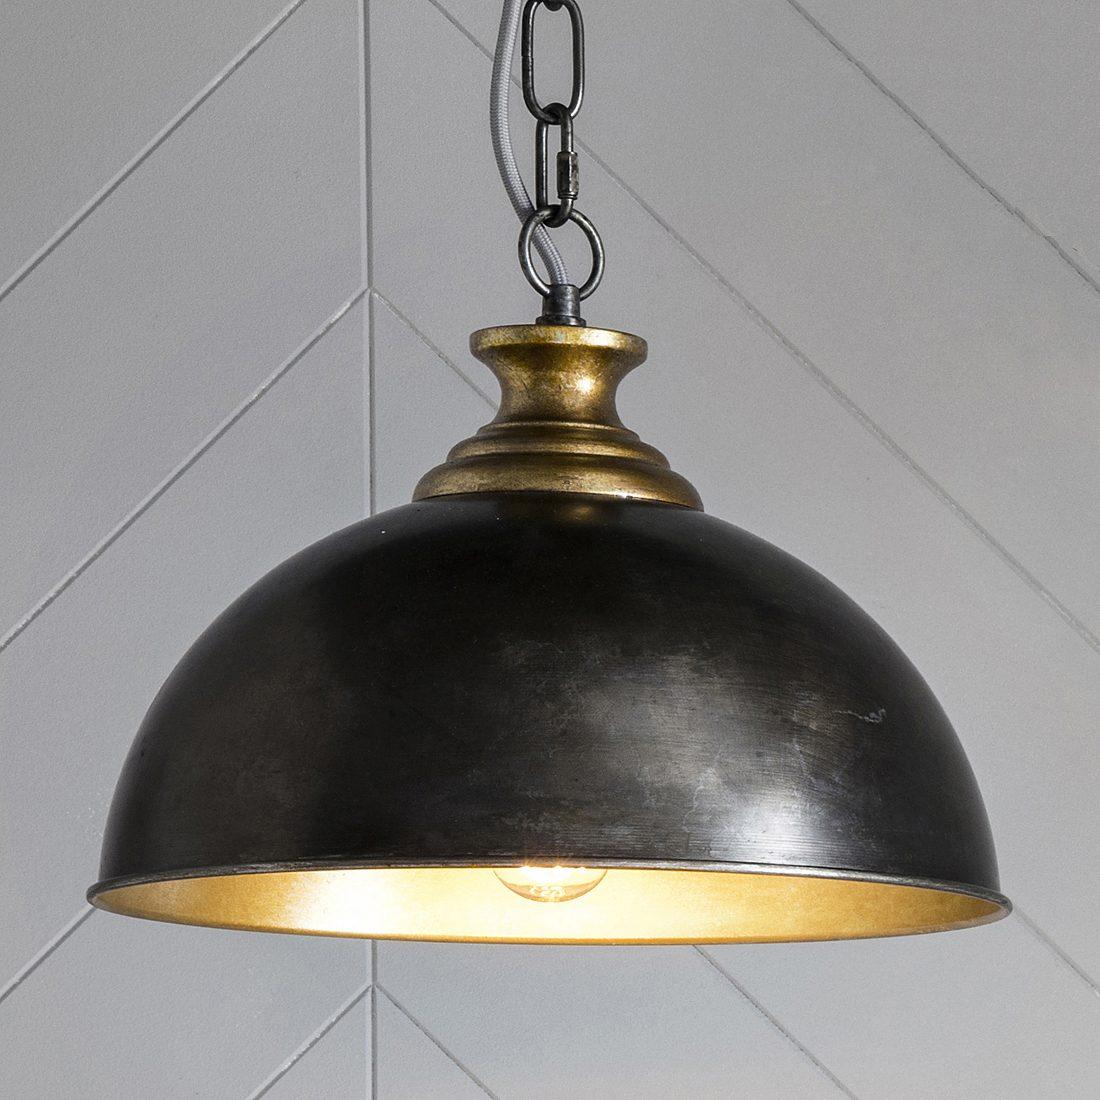 Black Domed Industrial Pendant Light Primrose Plum